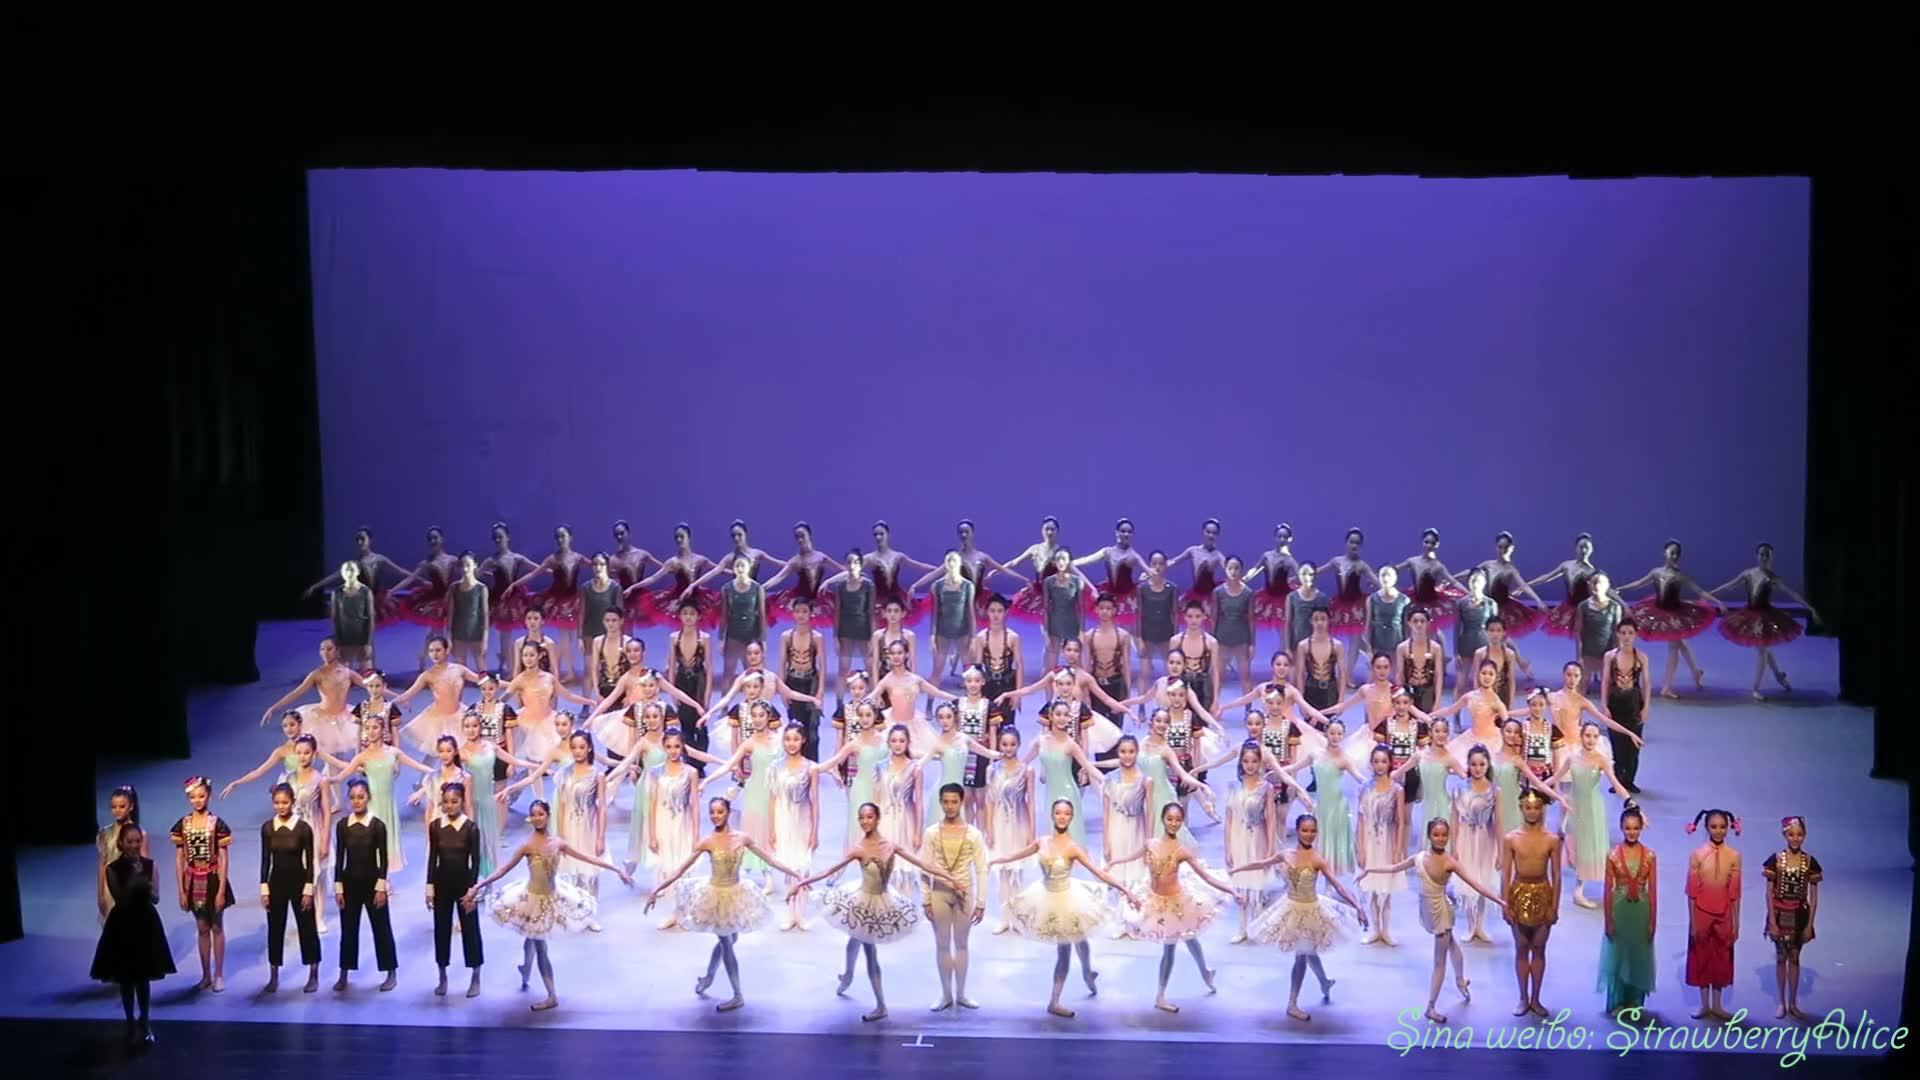 【Strawberry Alice】曼舞长宁——舞蹈专场 - 谢幕,2019-11-20 上海长宁区国际舞蹈中心